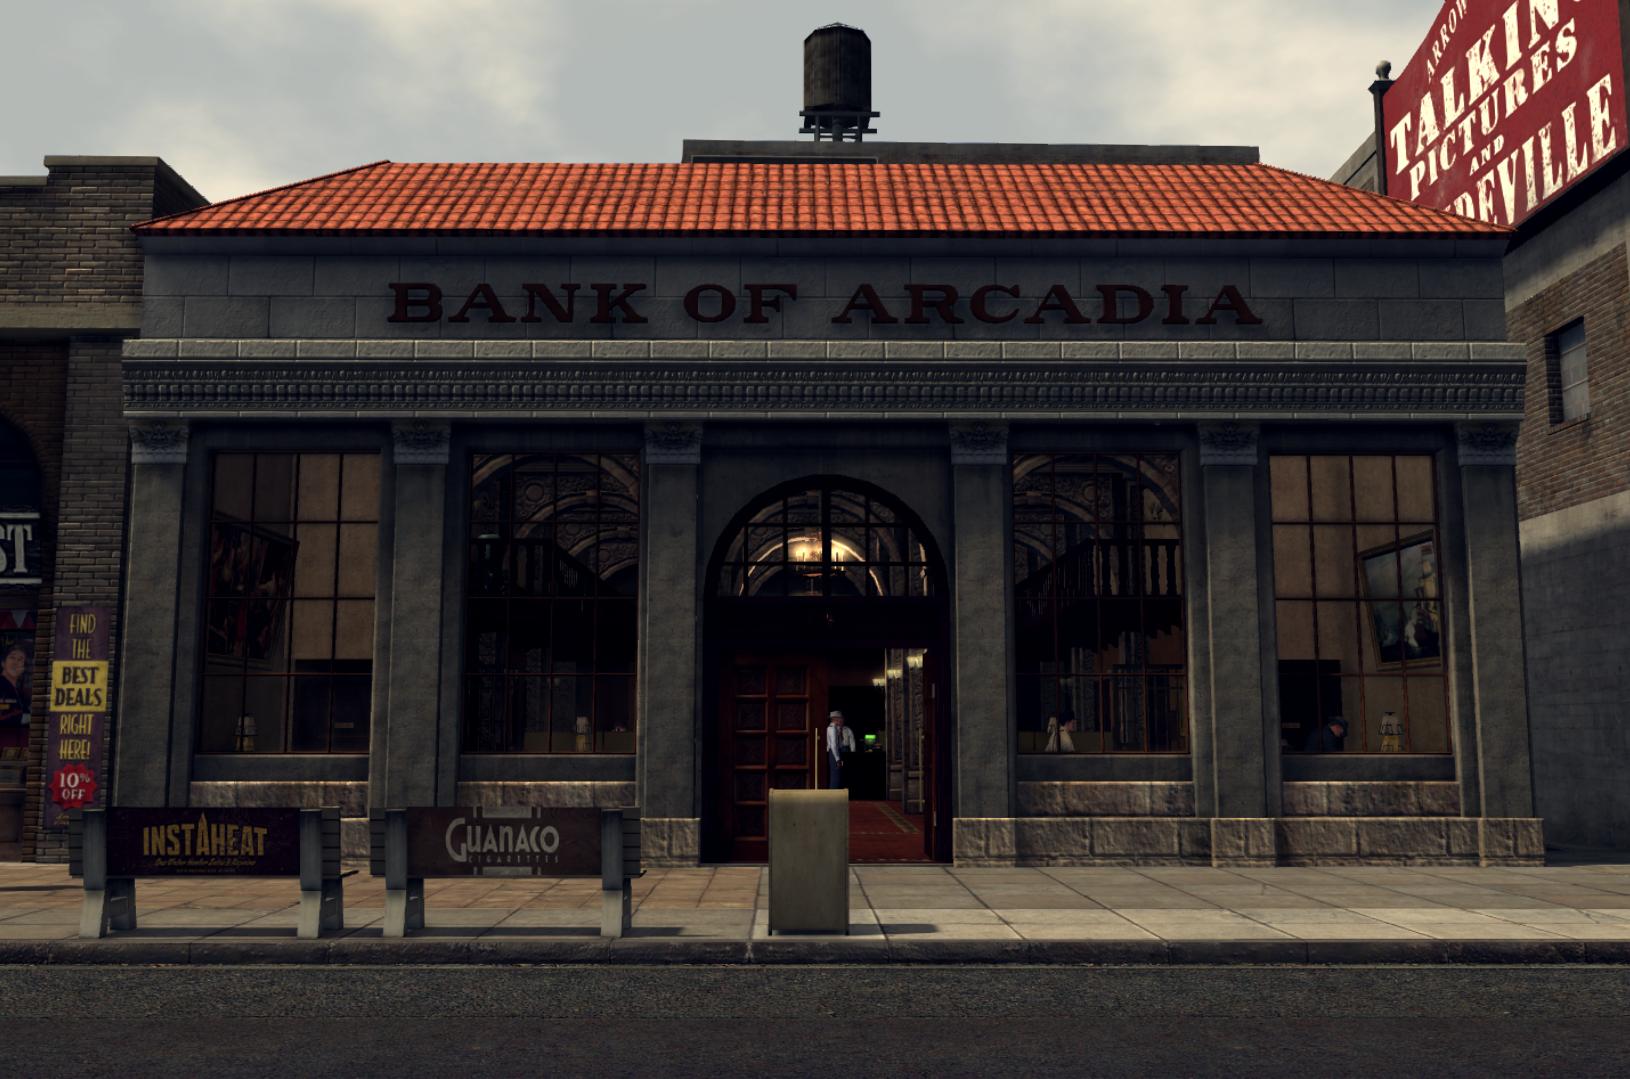 Bank of Arcadia